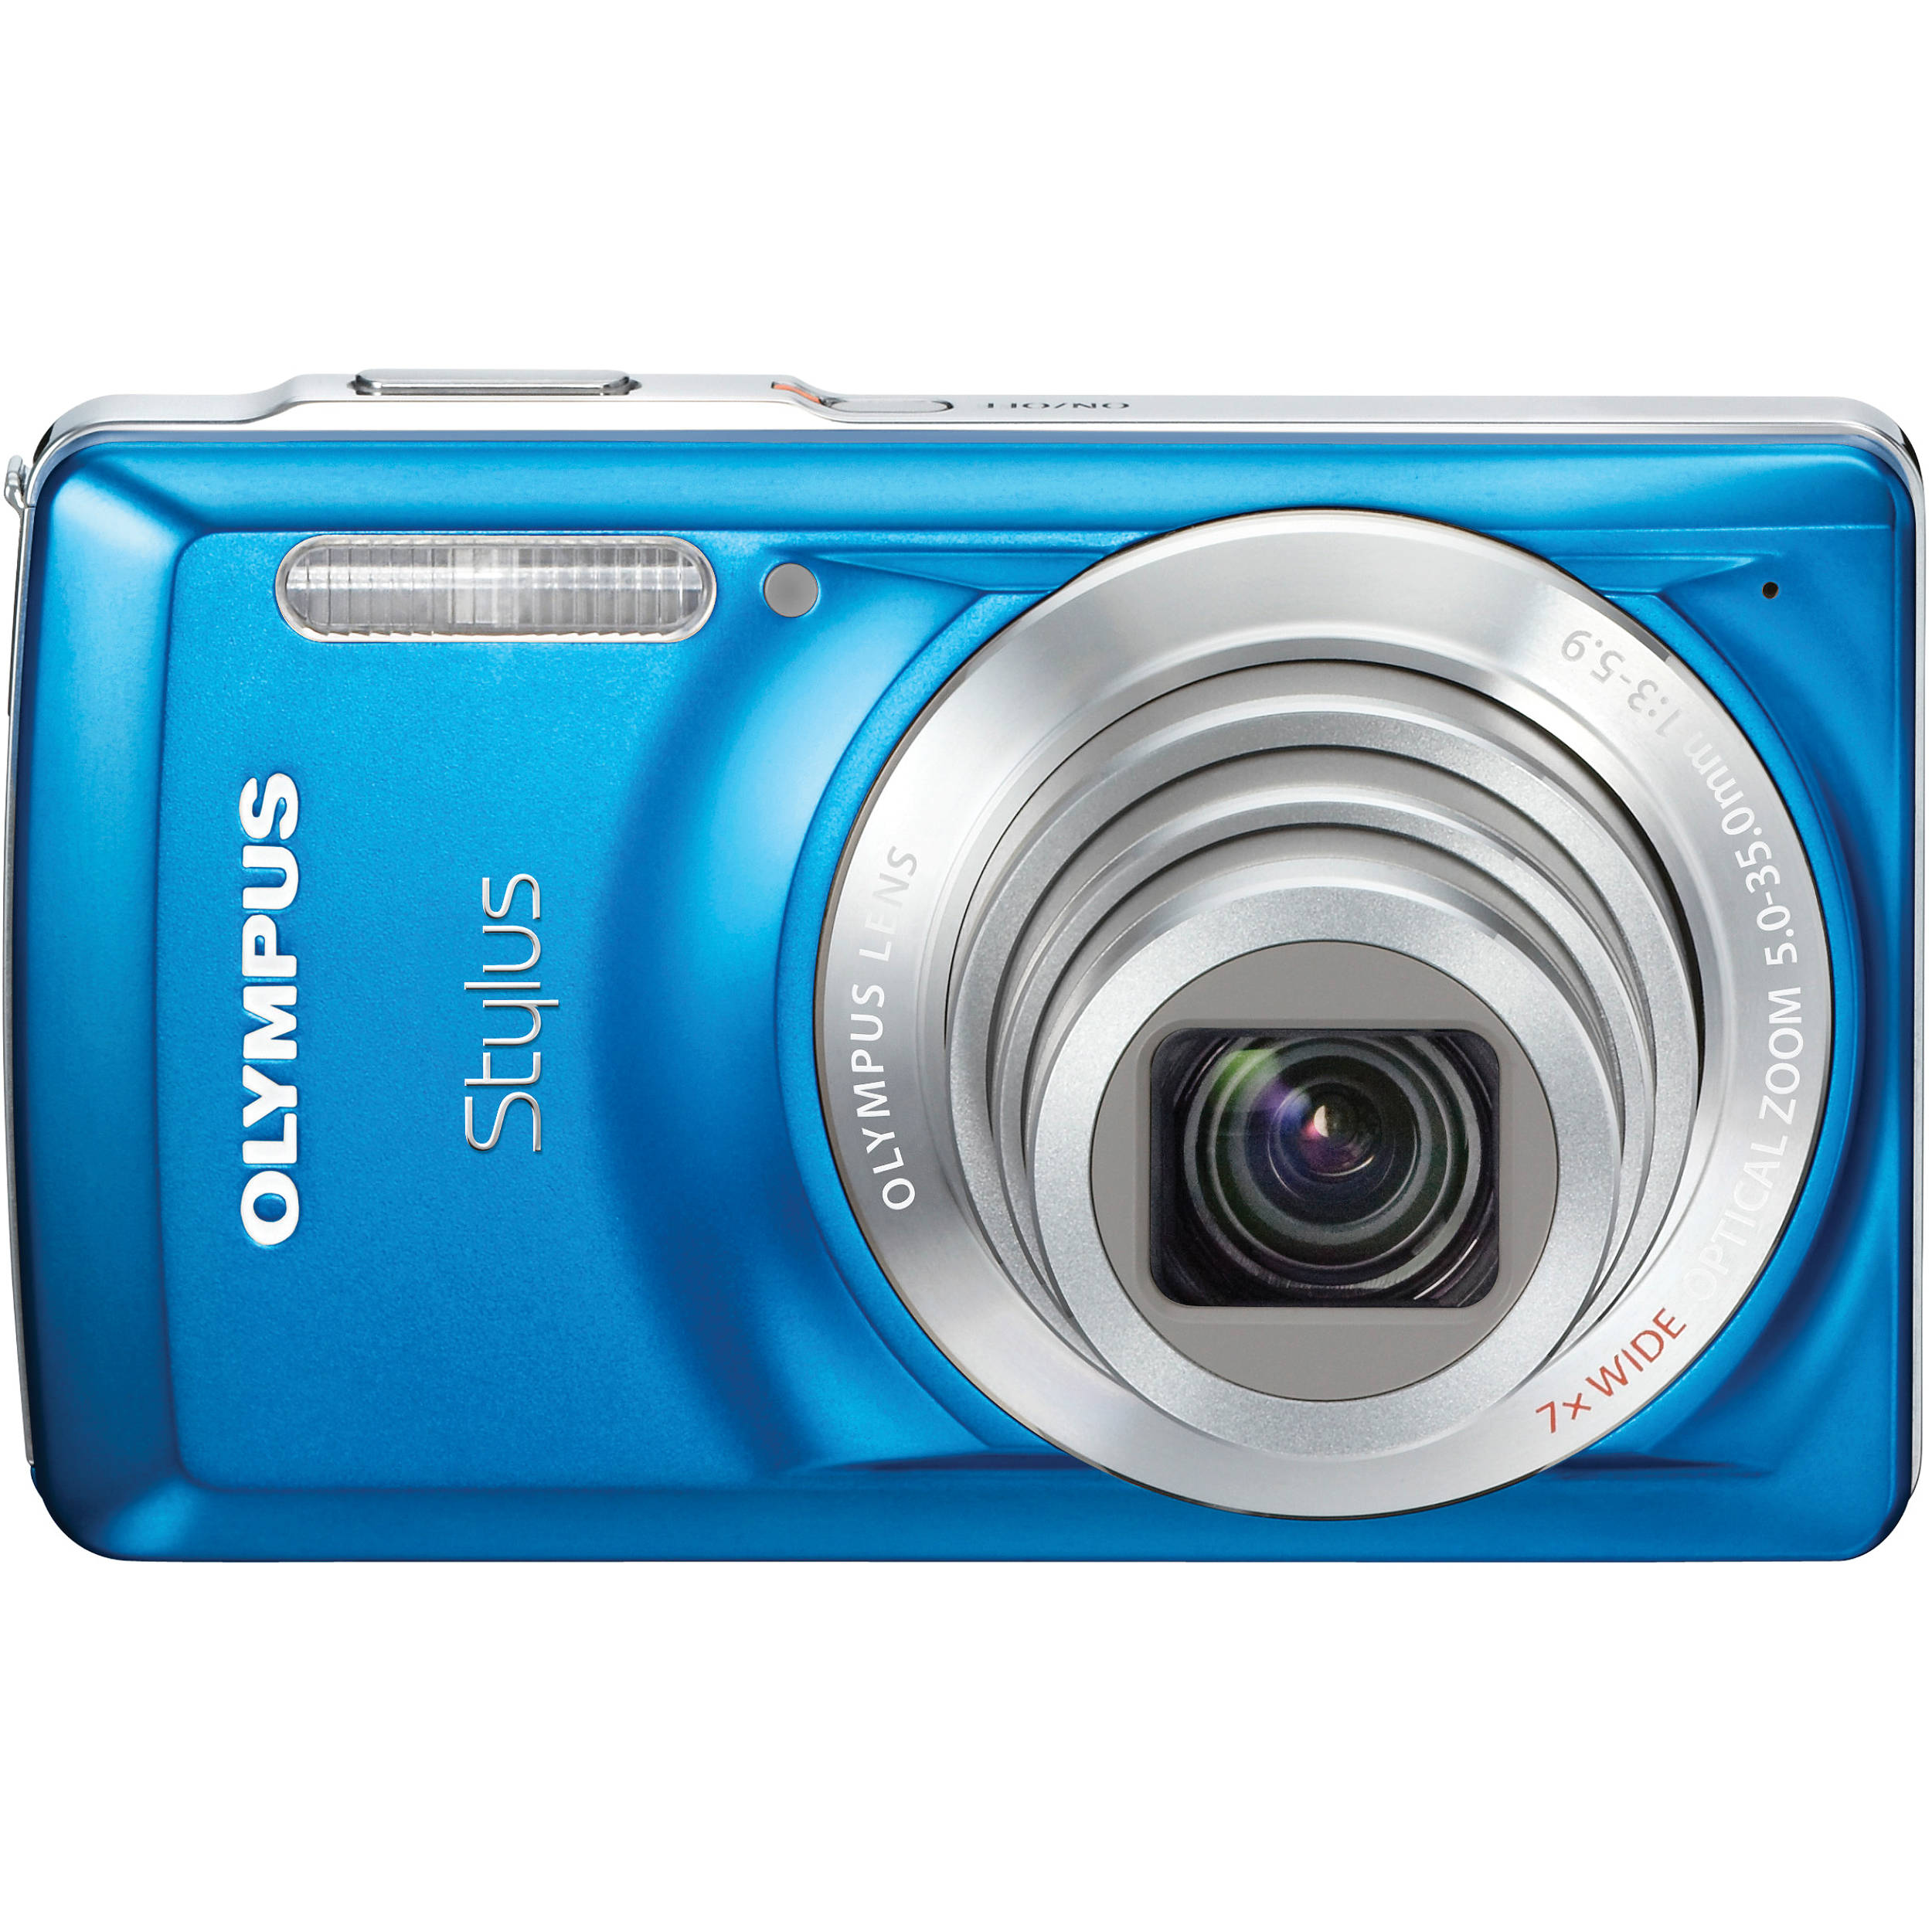 olympus stylus 7030 digital camera blue 227575 b h photo video rh bhphotovideo com olympus stylus 7010 manual Olympus Stylus Film